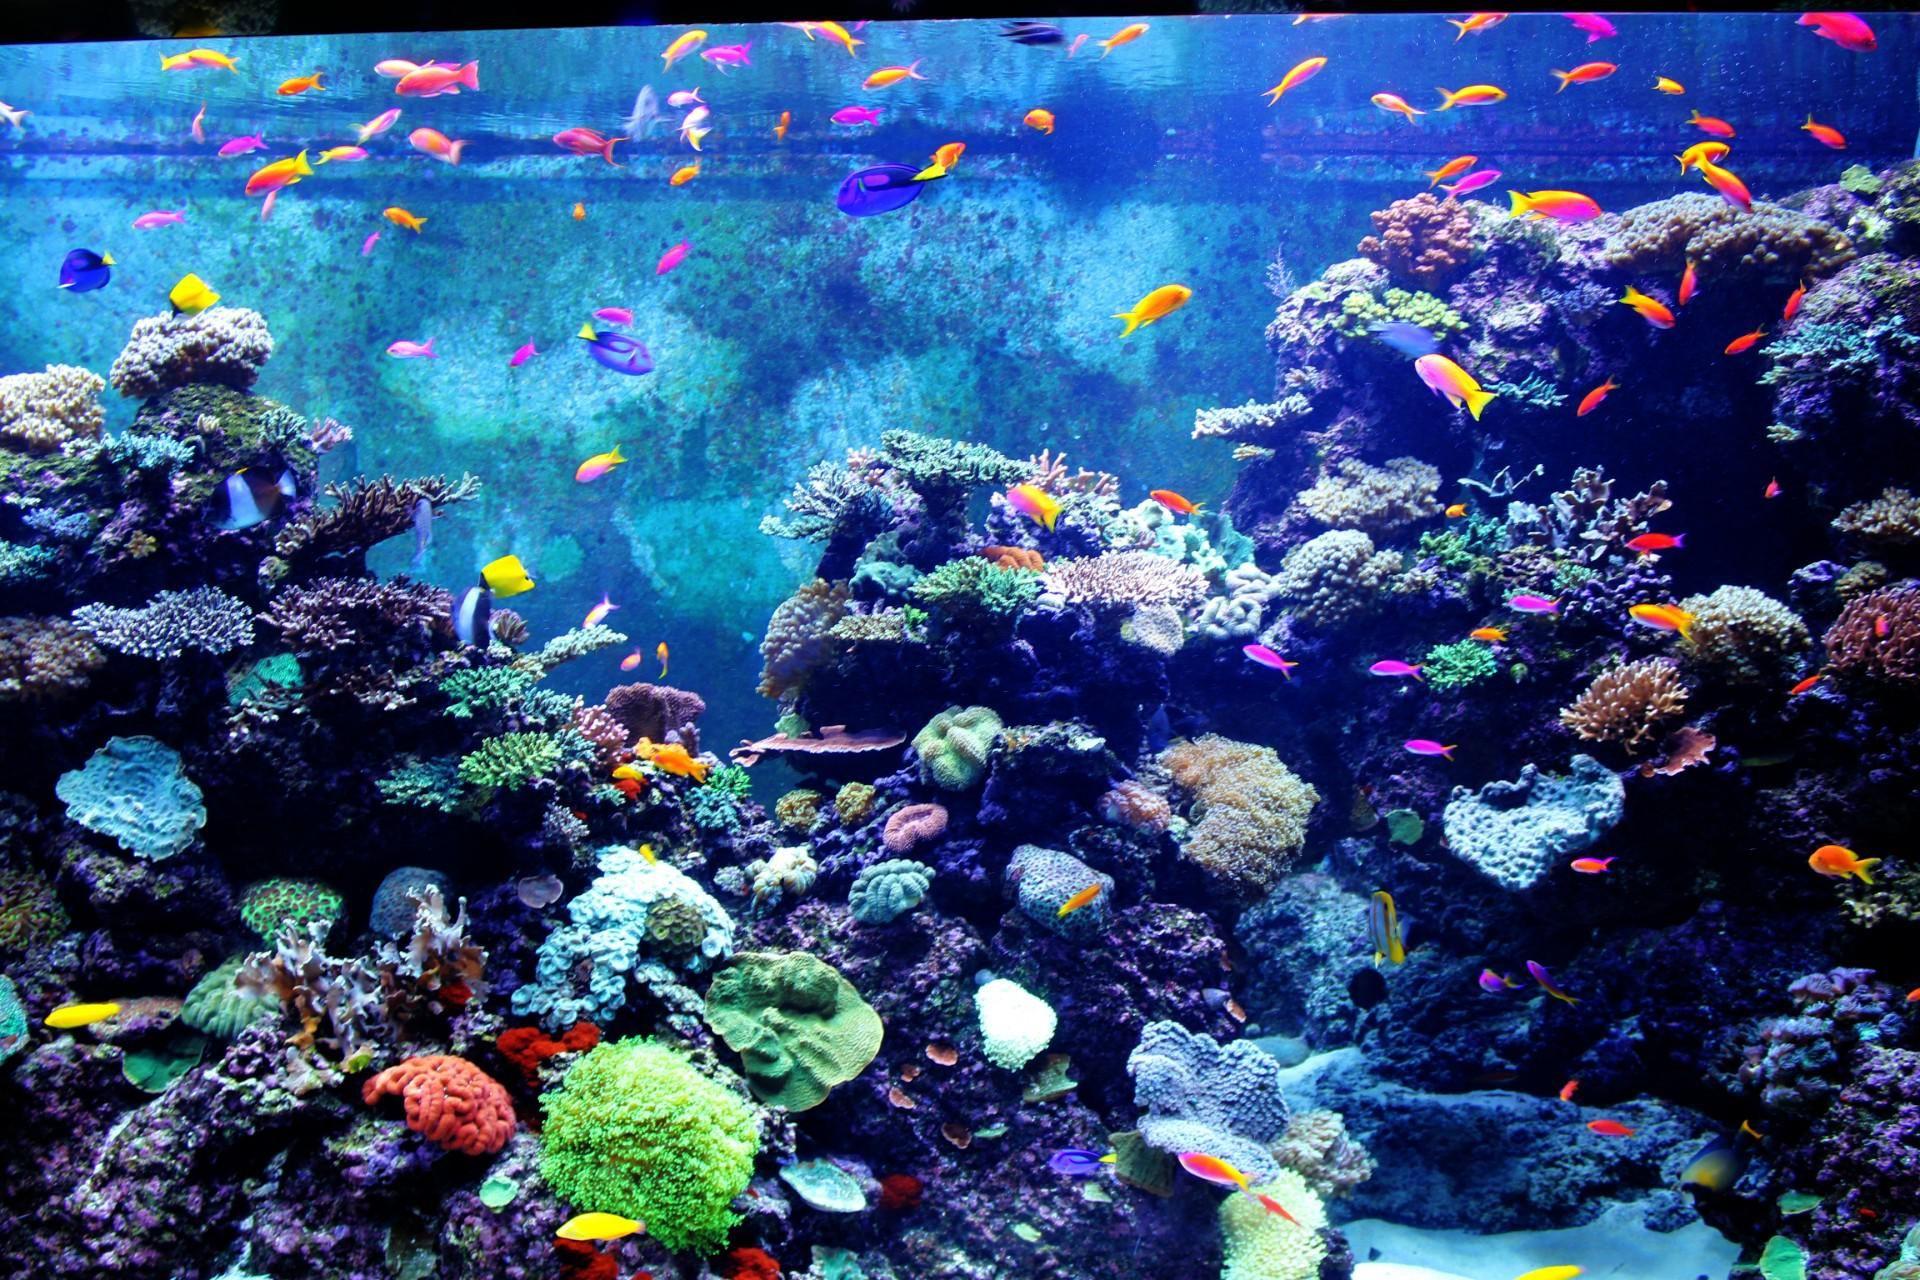 aquarium live wallpapers google play store revenue download 1920a—1280 aquarium wallpaper 24 wallpapers